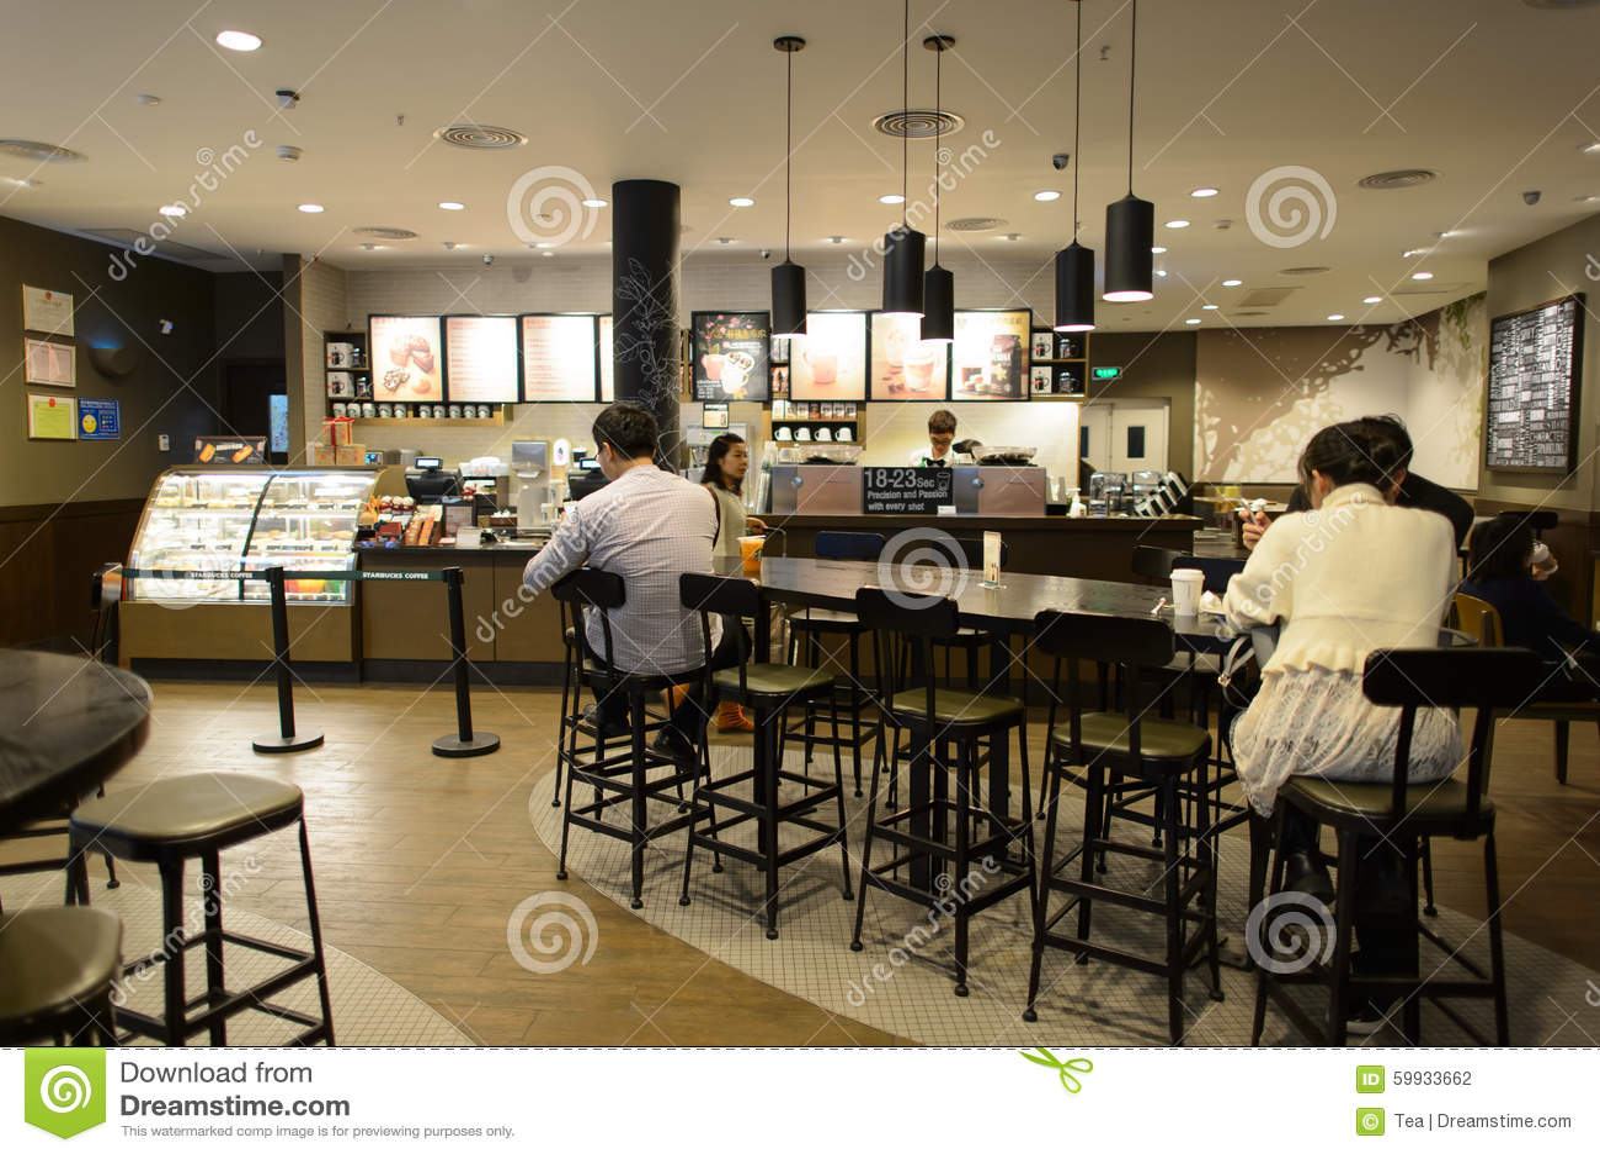 American Global Coffee Company